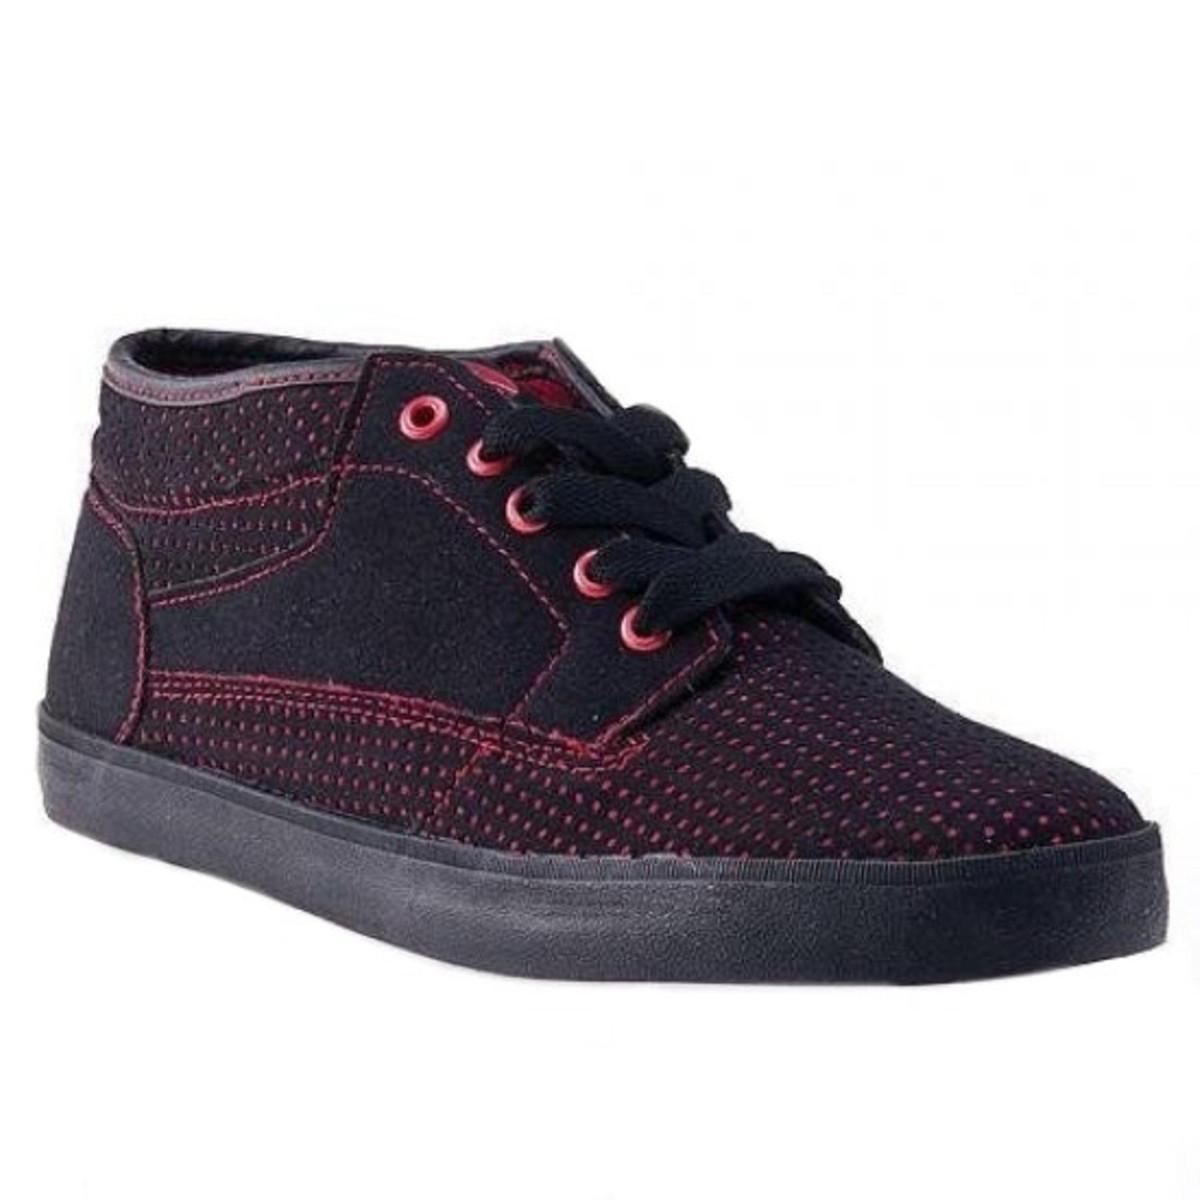 Osiris Skateboard Schuhe Chaveta schwarz rot rot rot BRZ f4a791